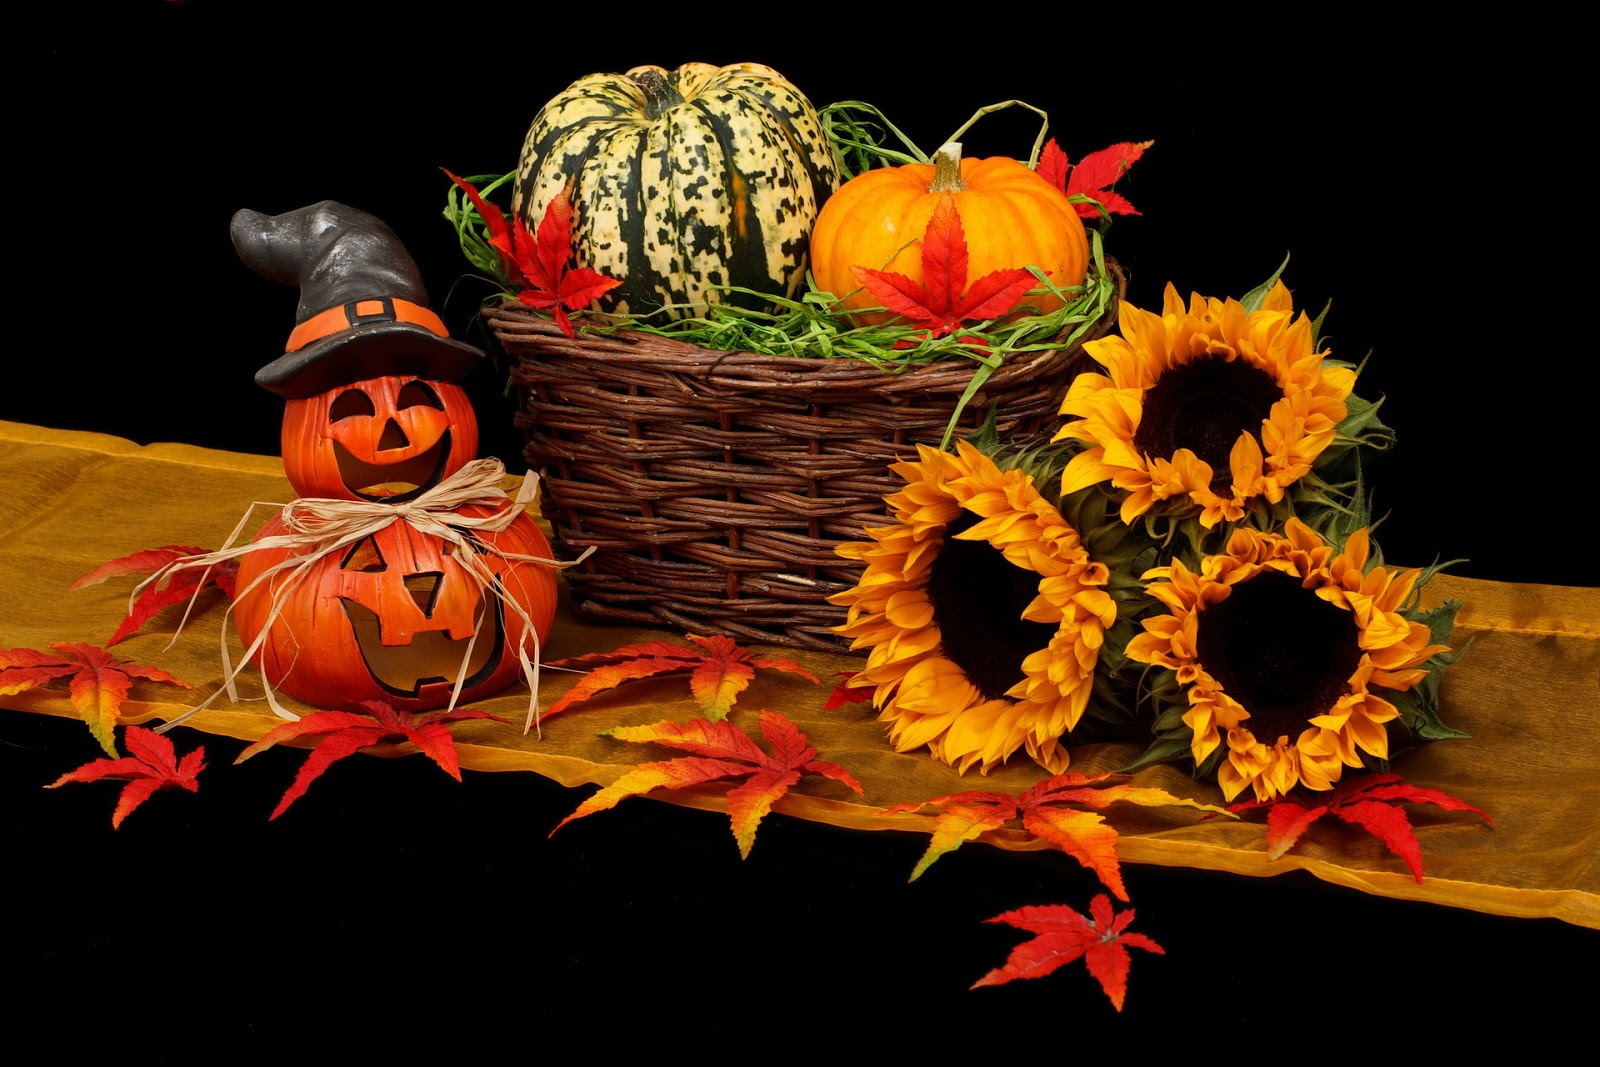 5 halloween decoration ideas for your new custom home, hagen homes, custom home builder in kenosha county